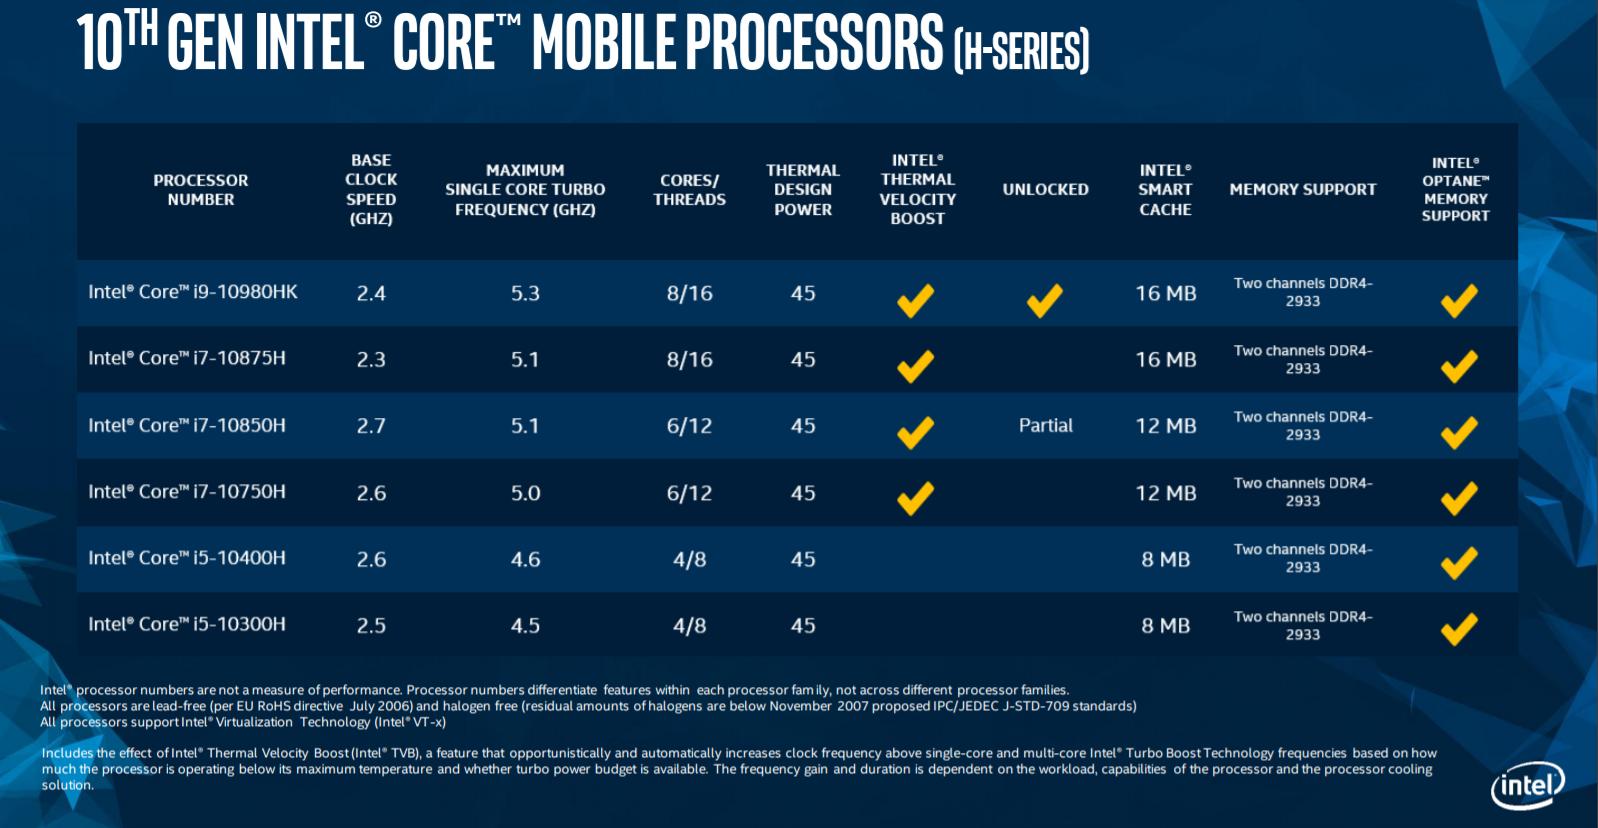 10th Gen Intel® Core™ H-Series Processors